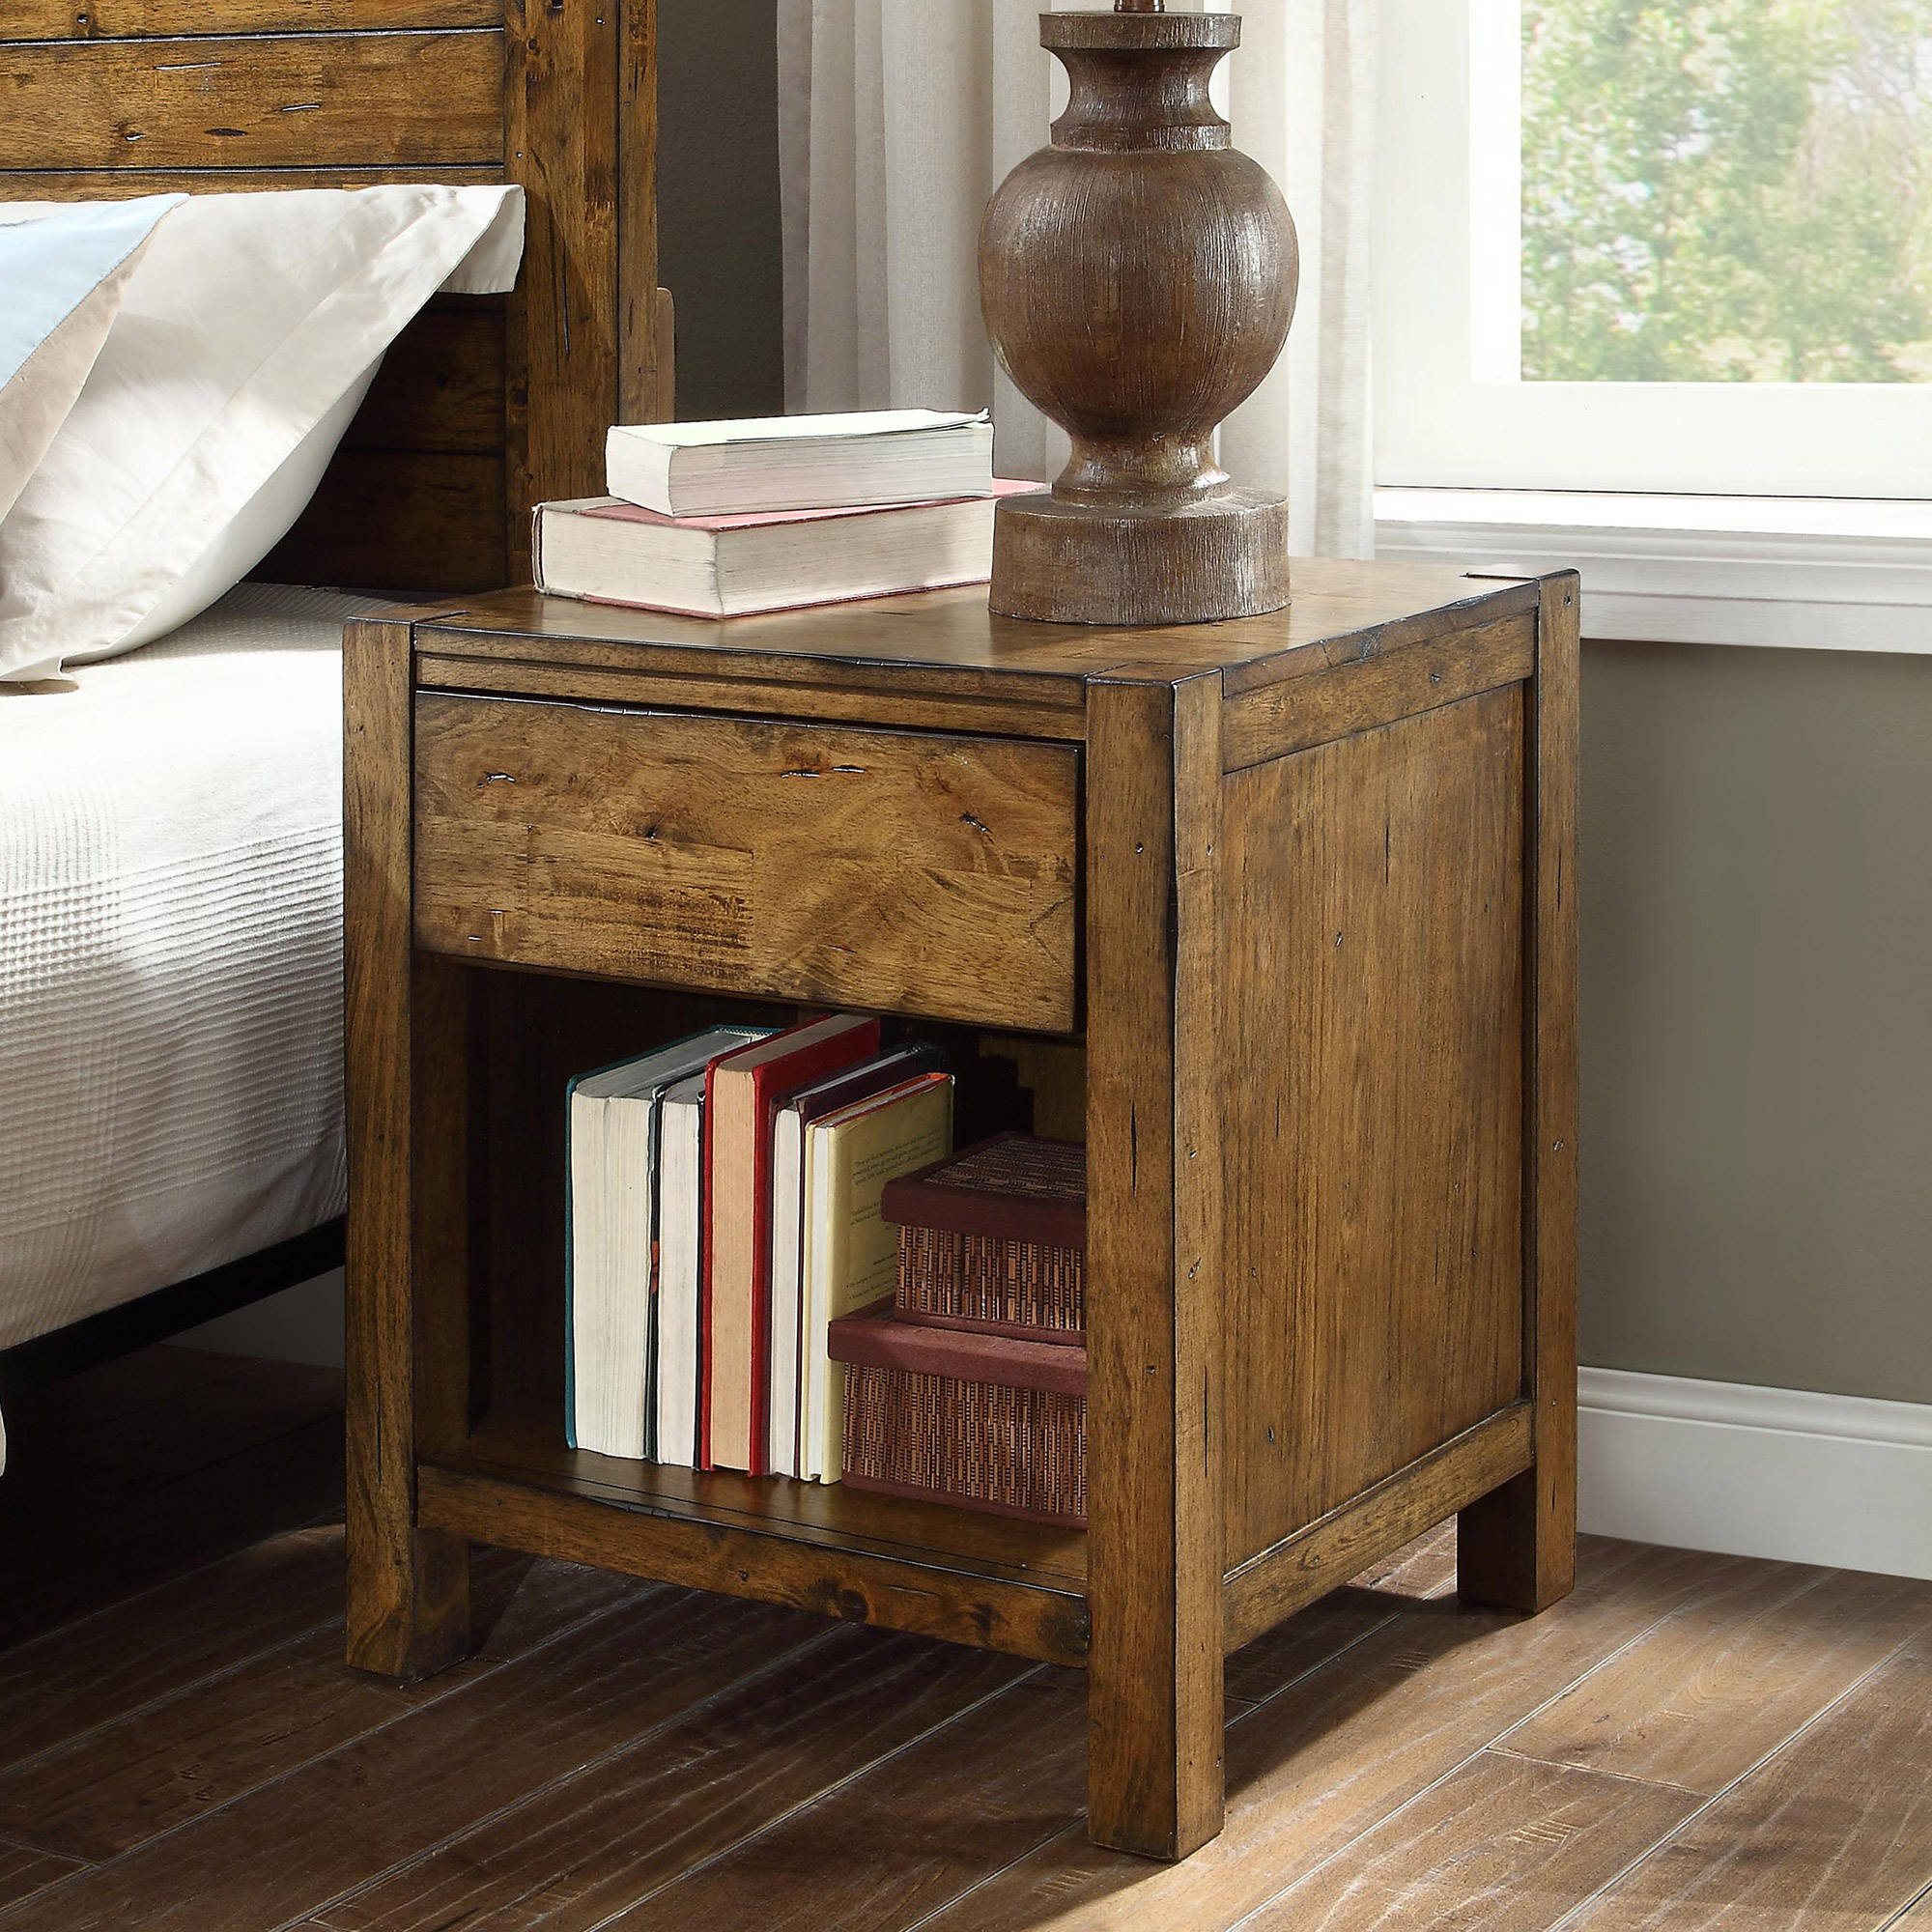 Nightstand Solid Wood Rustic Barn Wood Finish Night Stand Bedroom